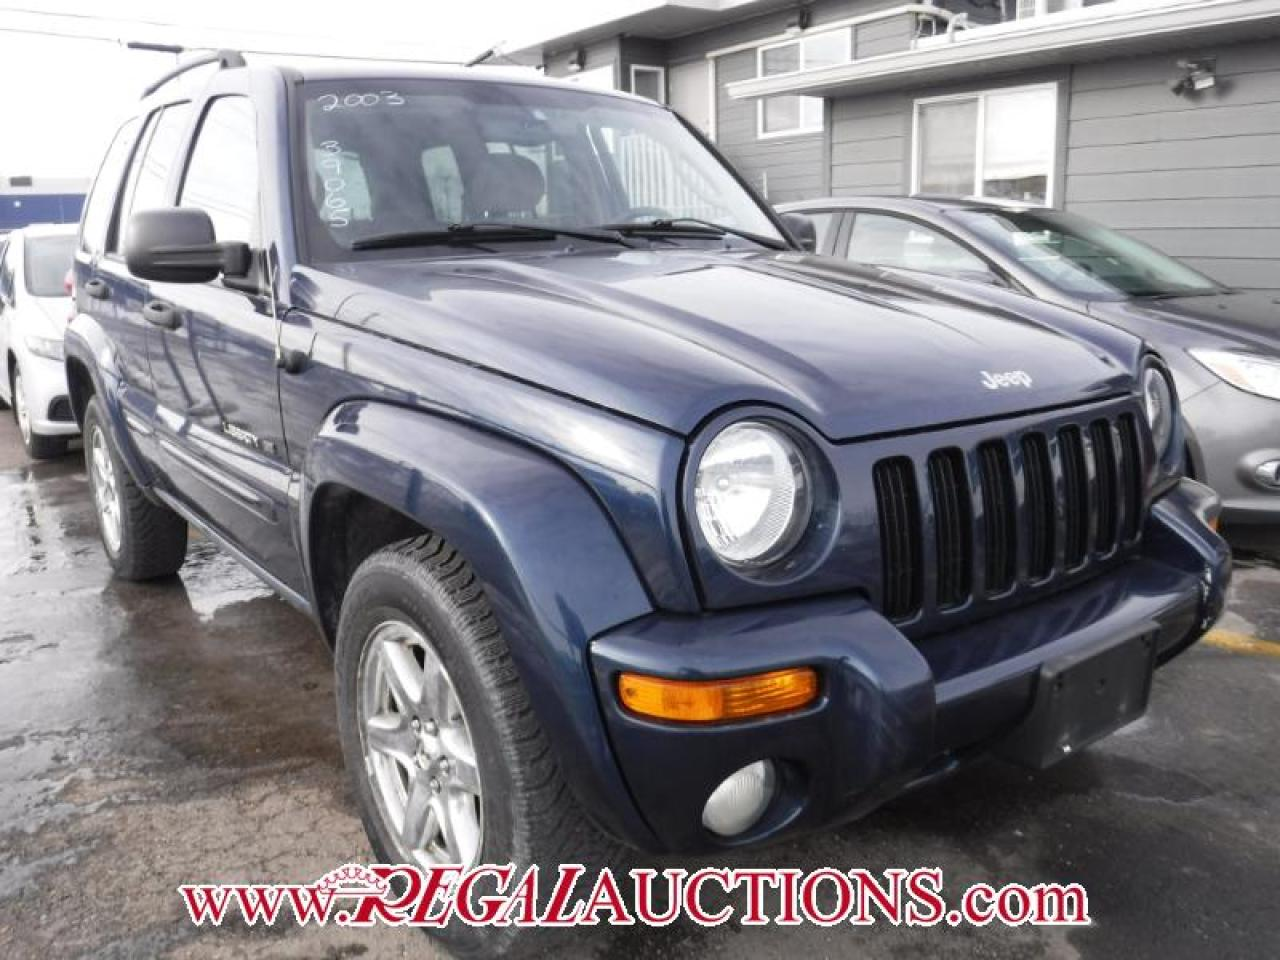 Photo of Blue 2003 Jeep Liberty